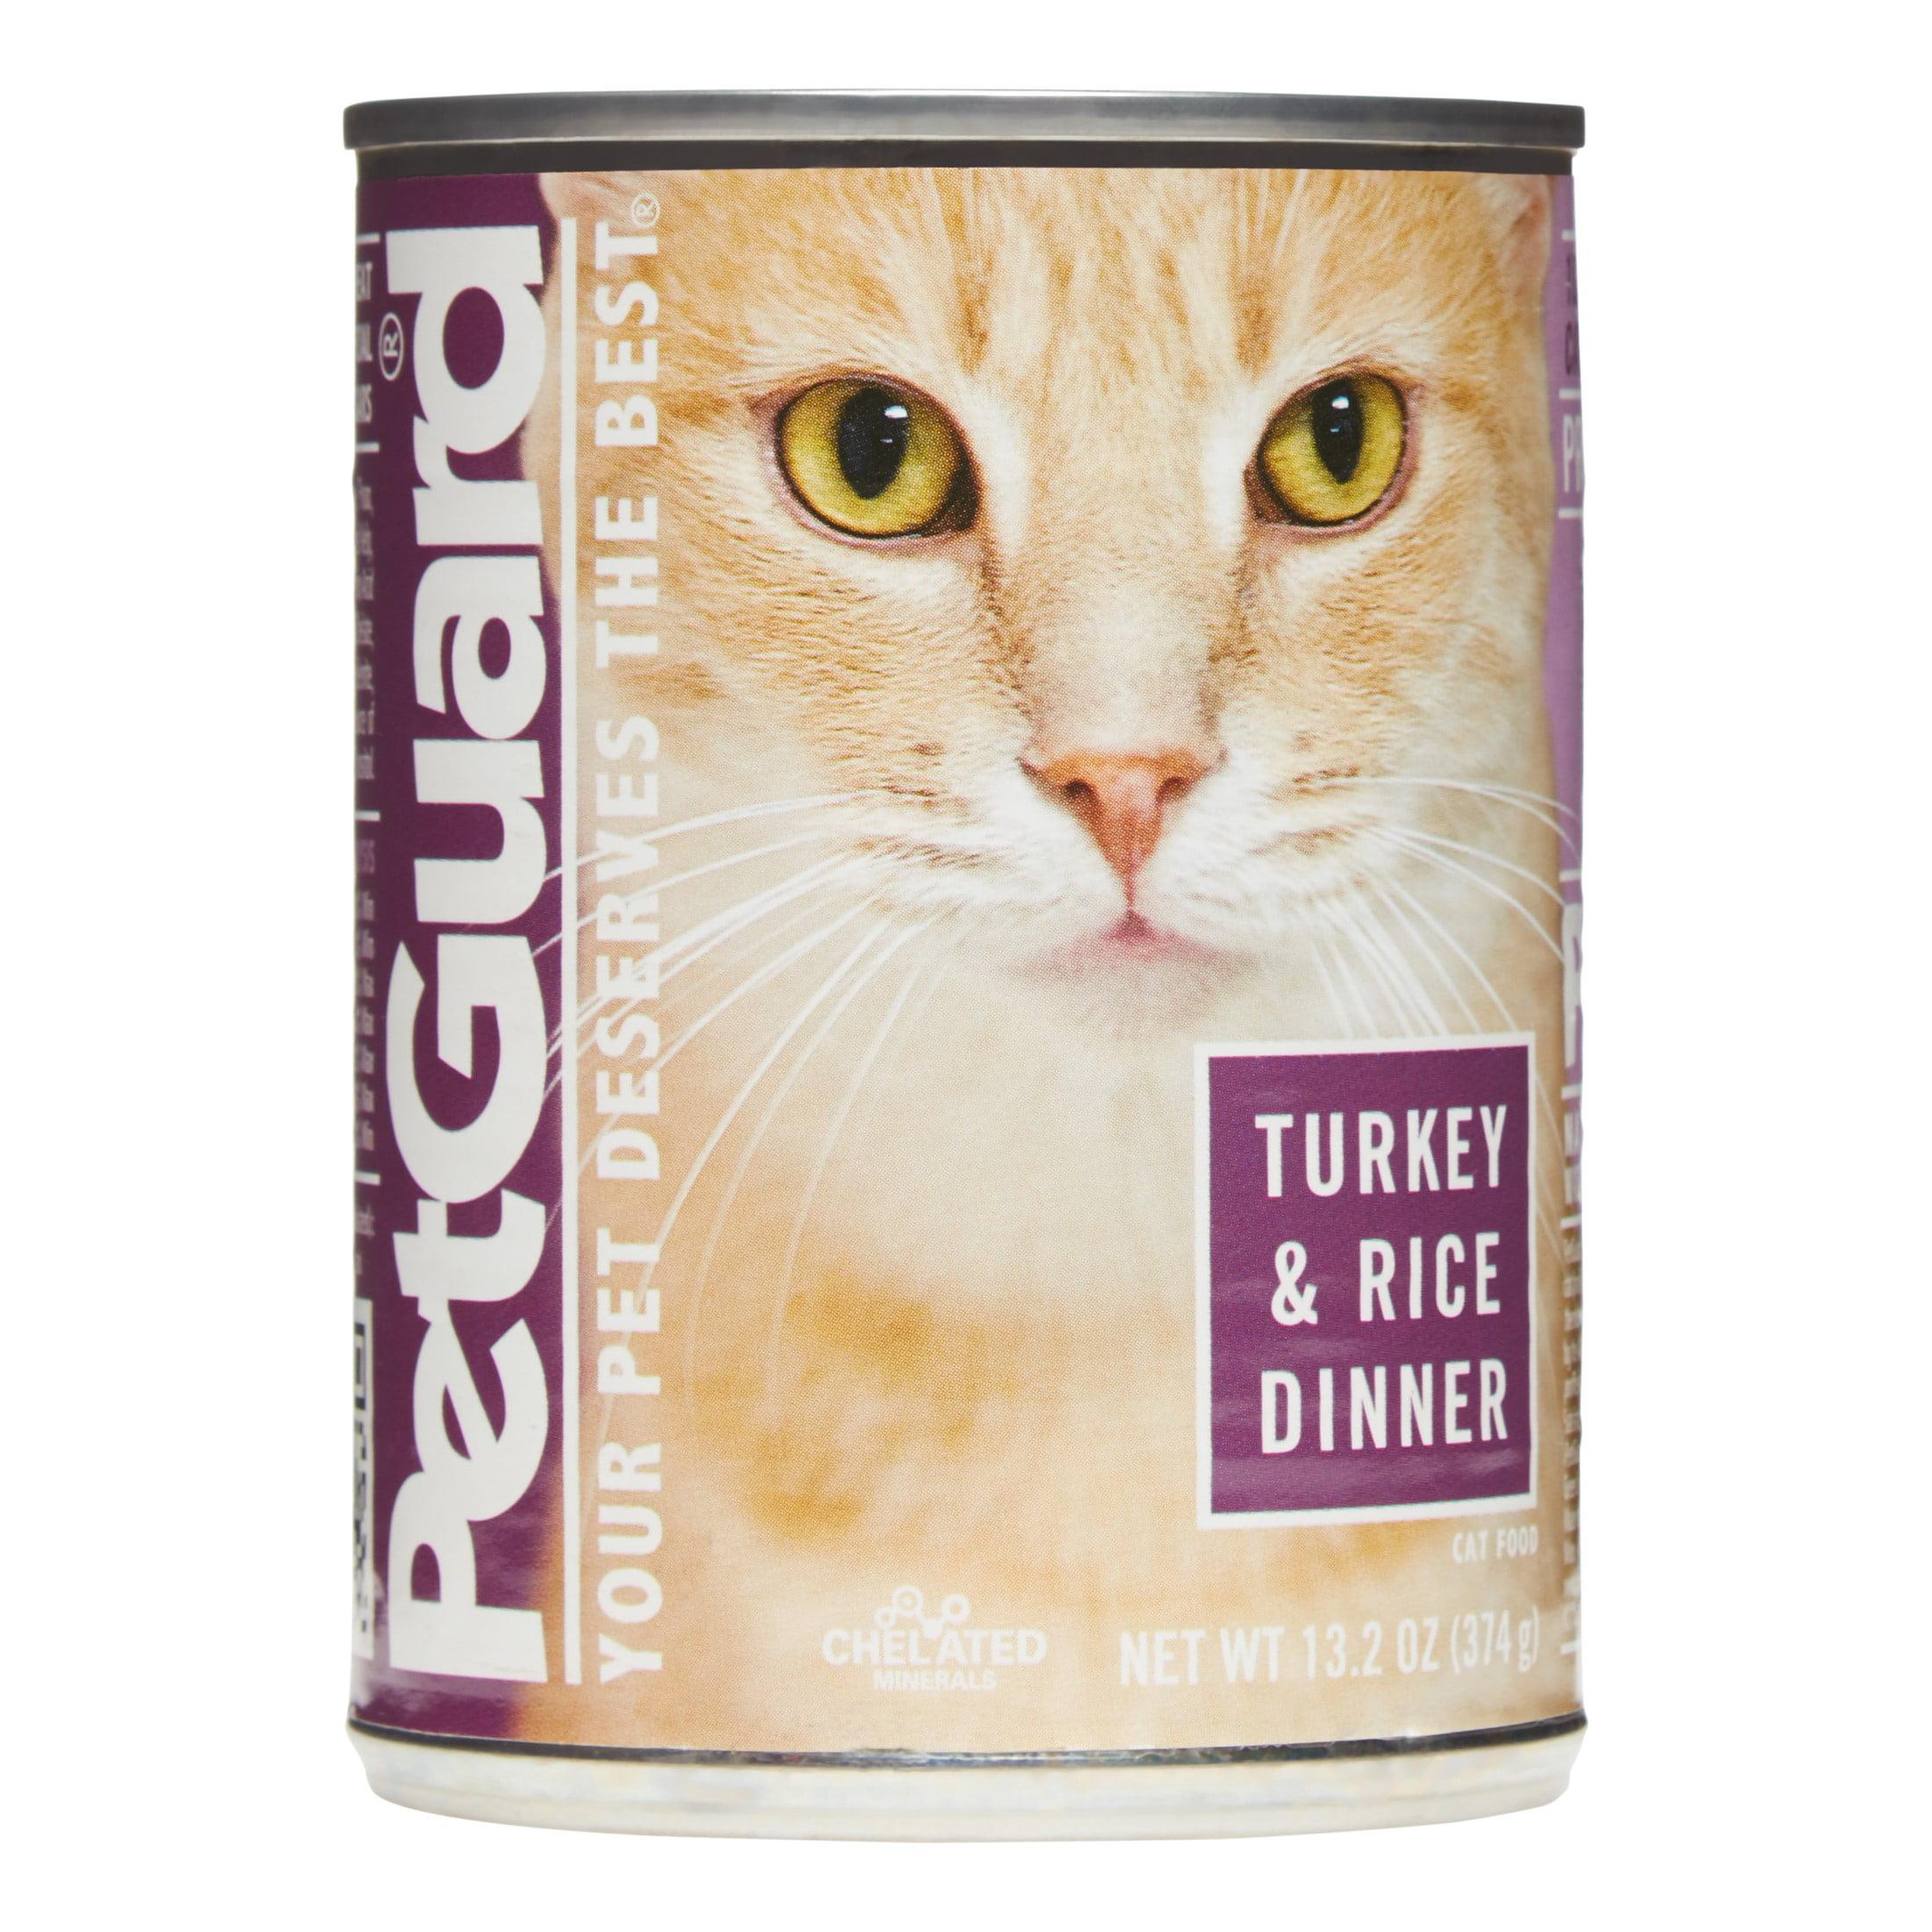 PetGuard Turkey & Rice Dinner Wet Cat Food, 13.2 oz